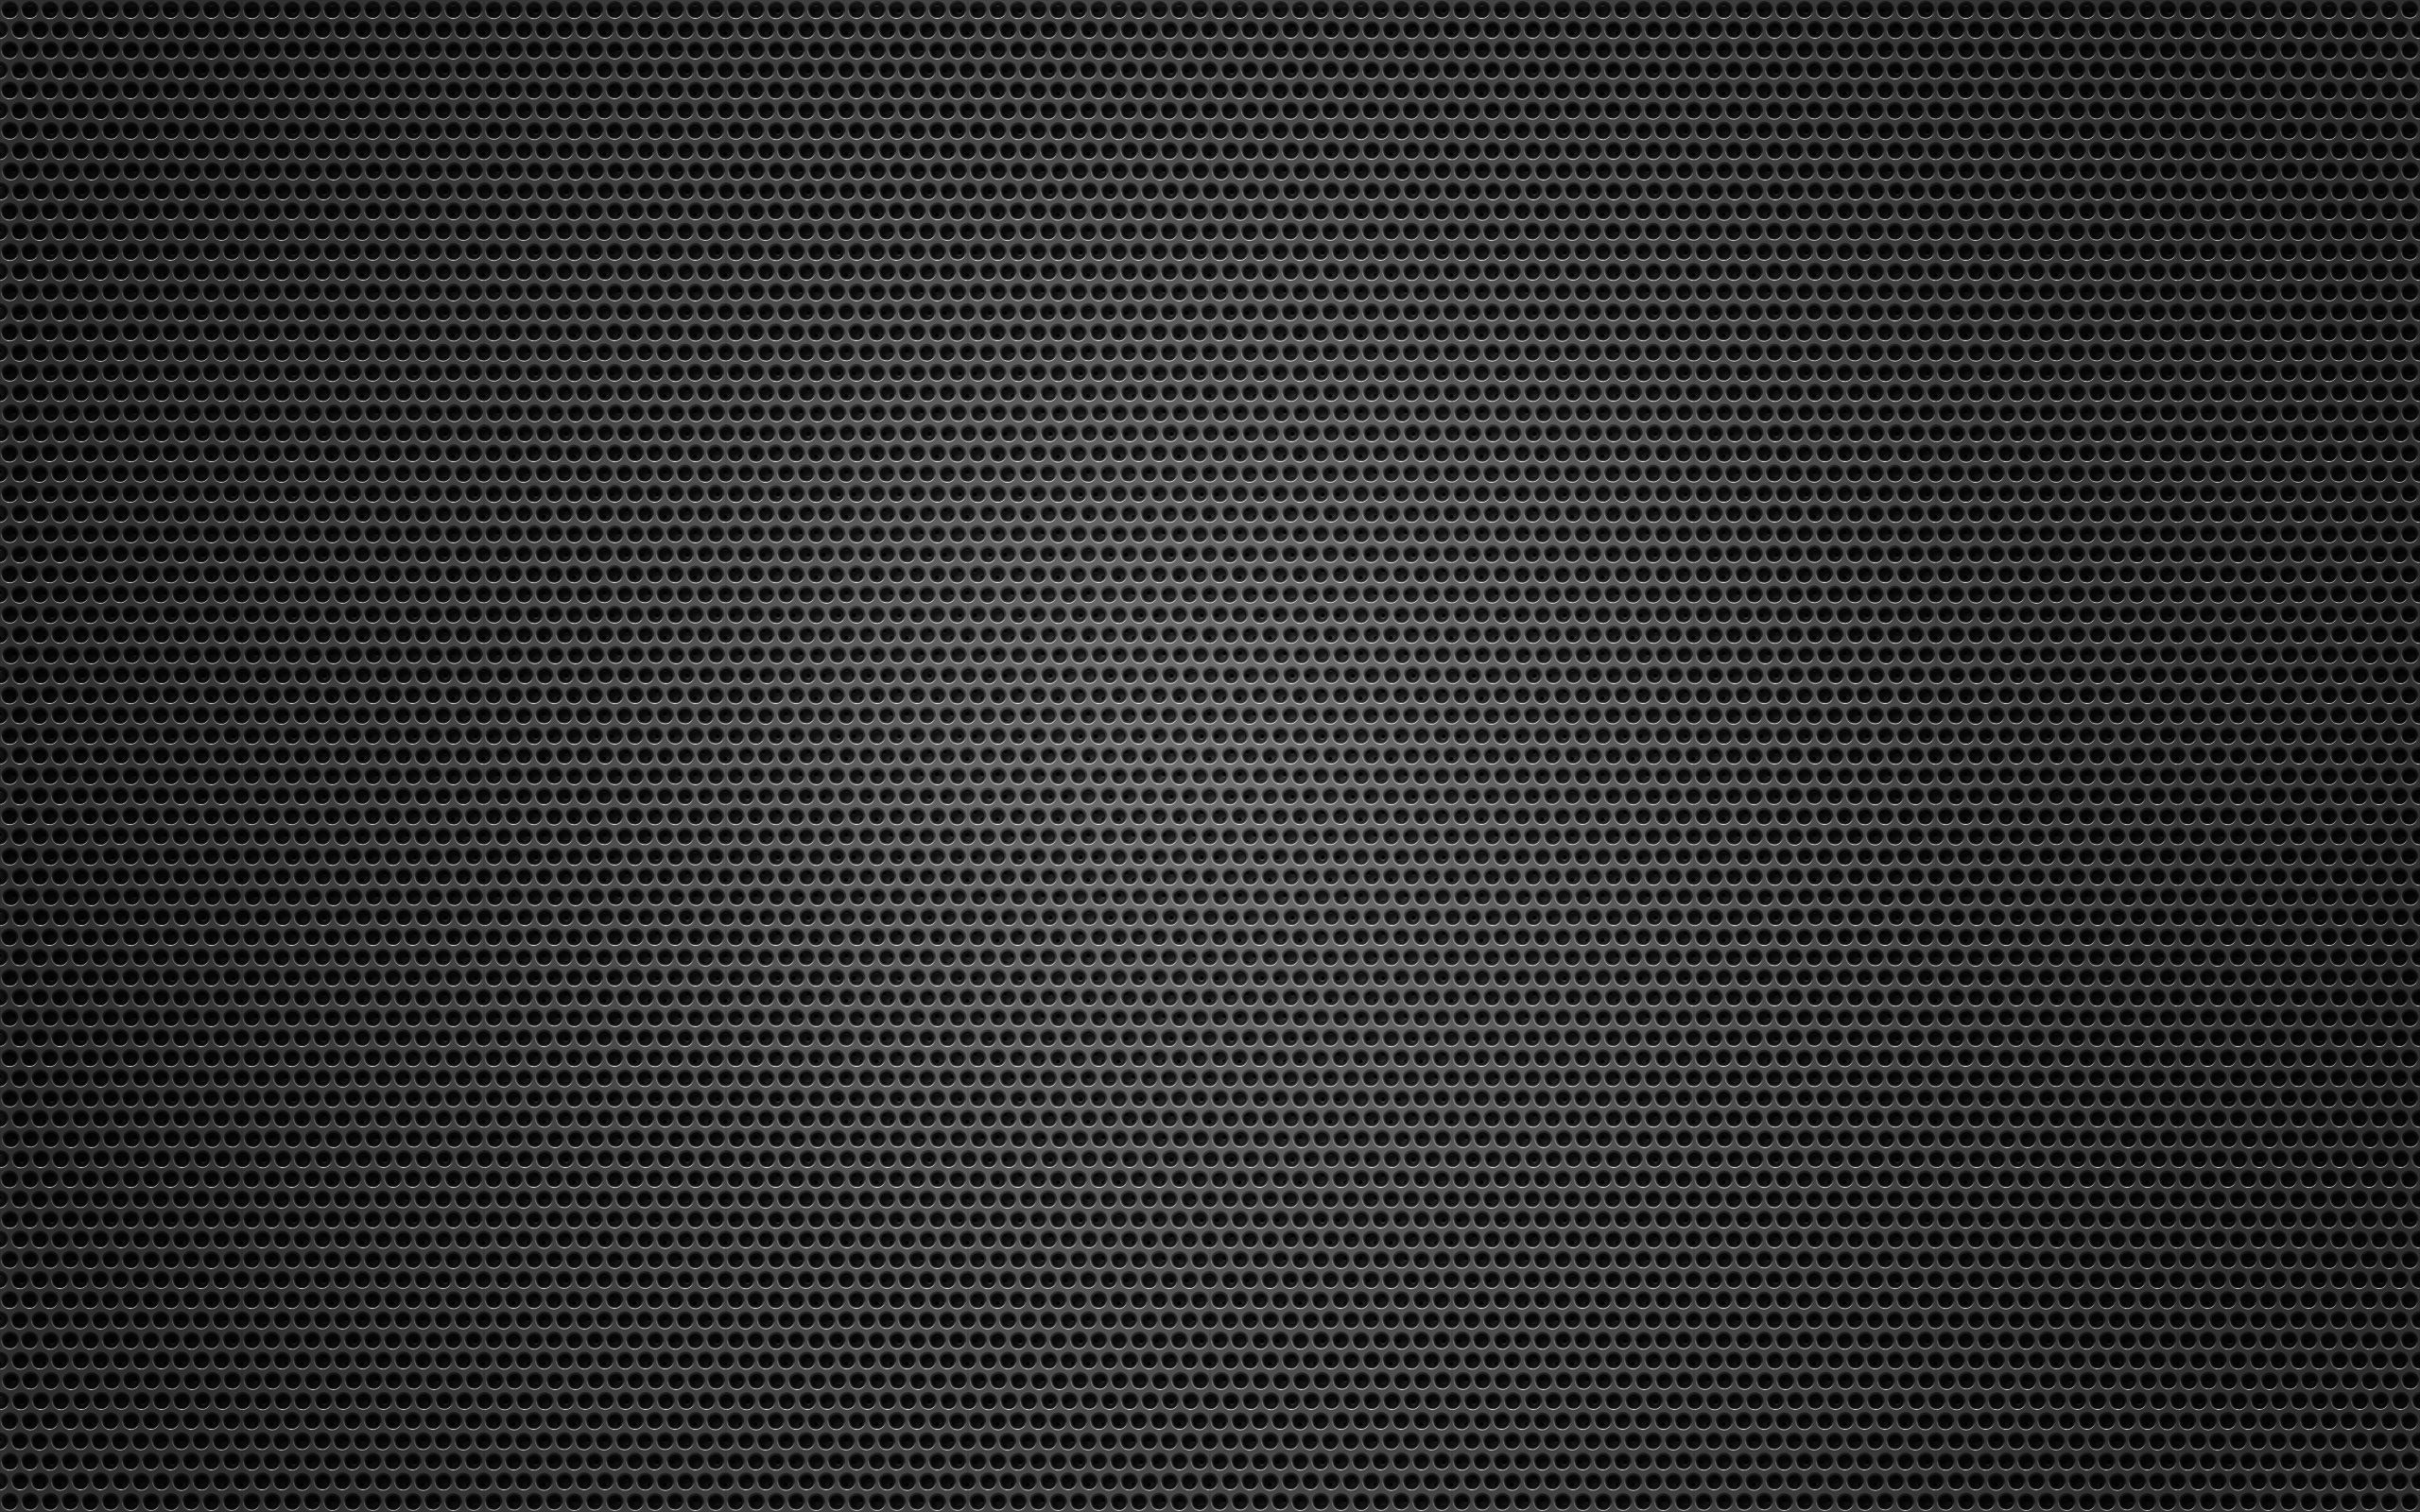 Wallpaper, Texture, Simple, Clean, Grey